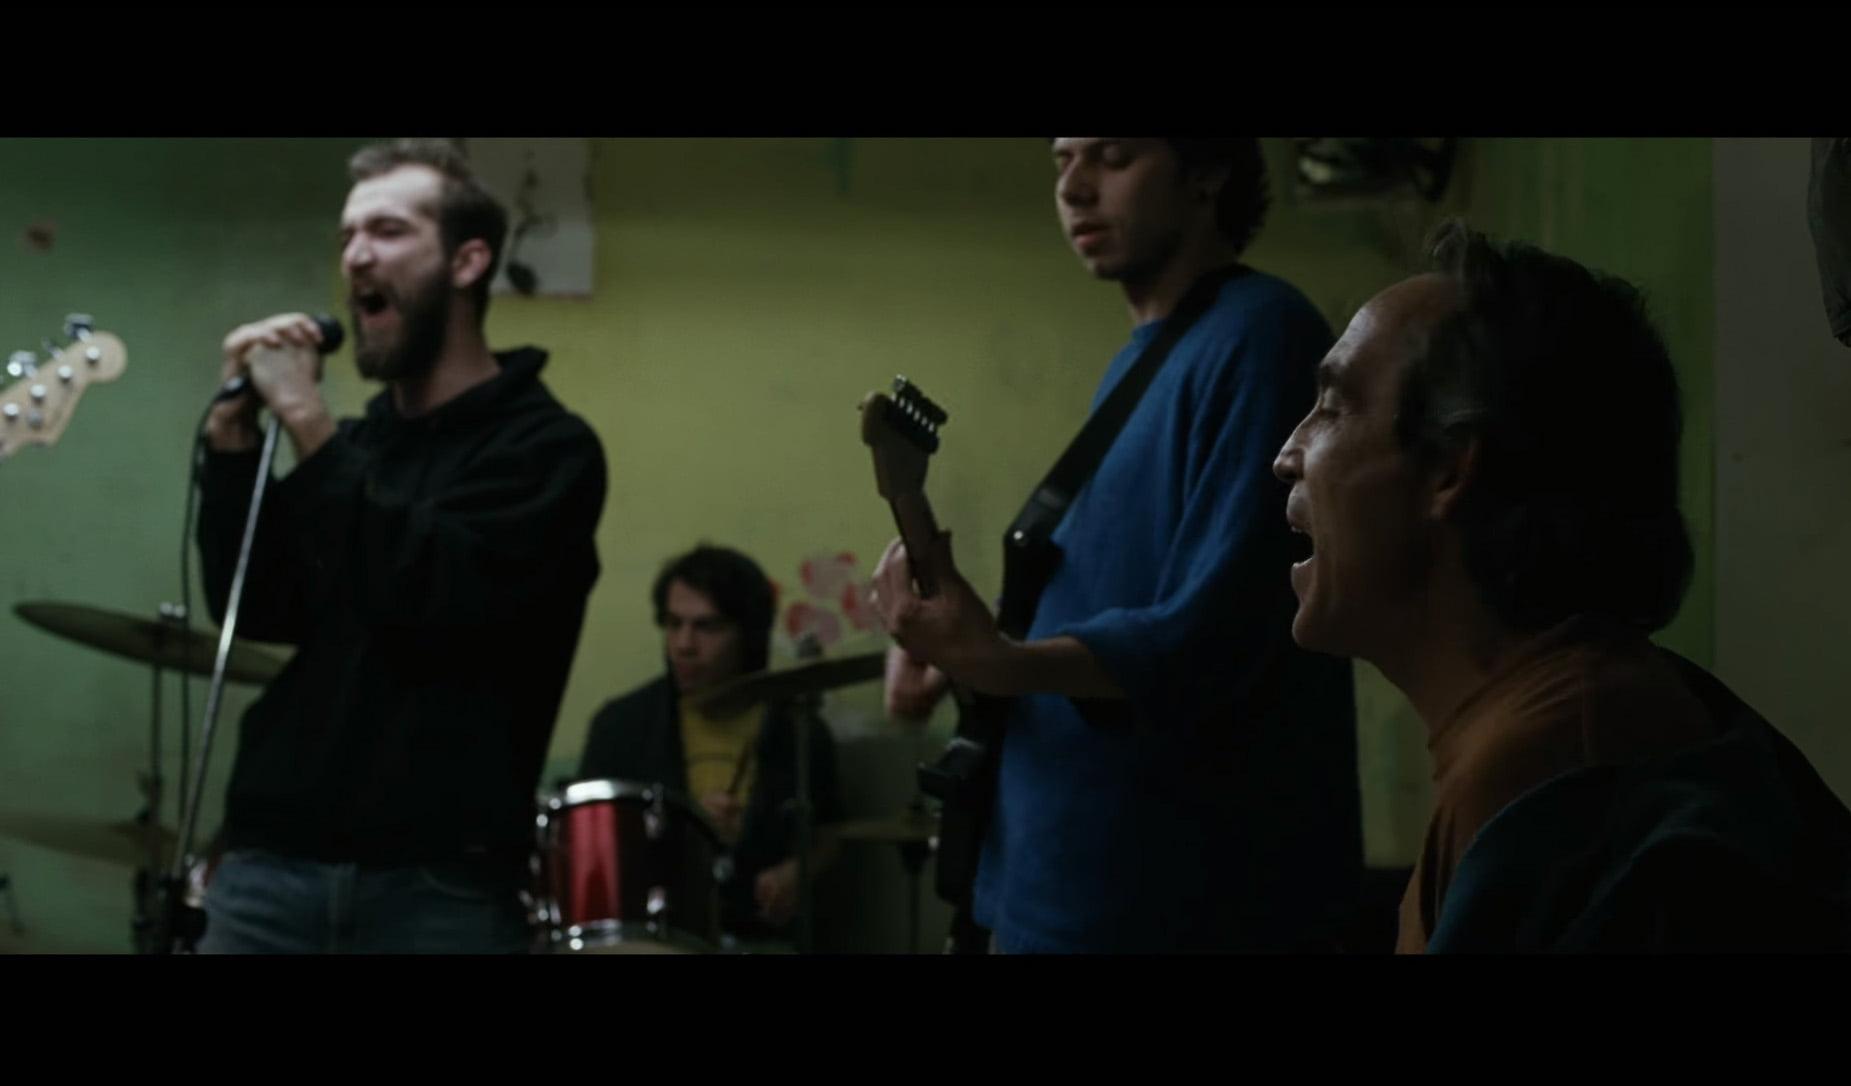 Rocker by Marian Crișan - CINEPUB